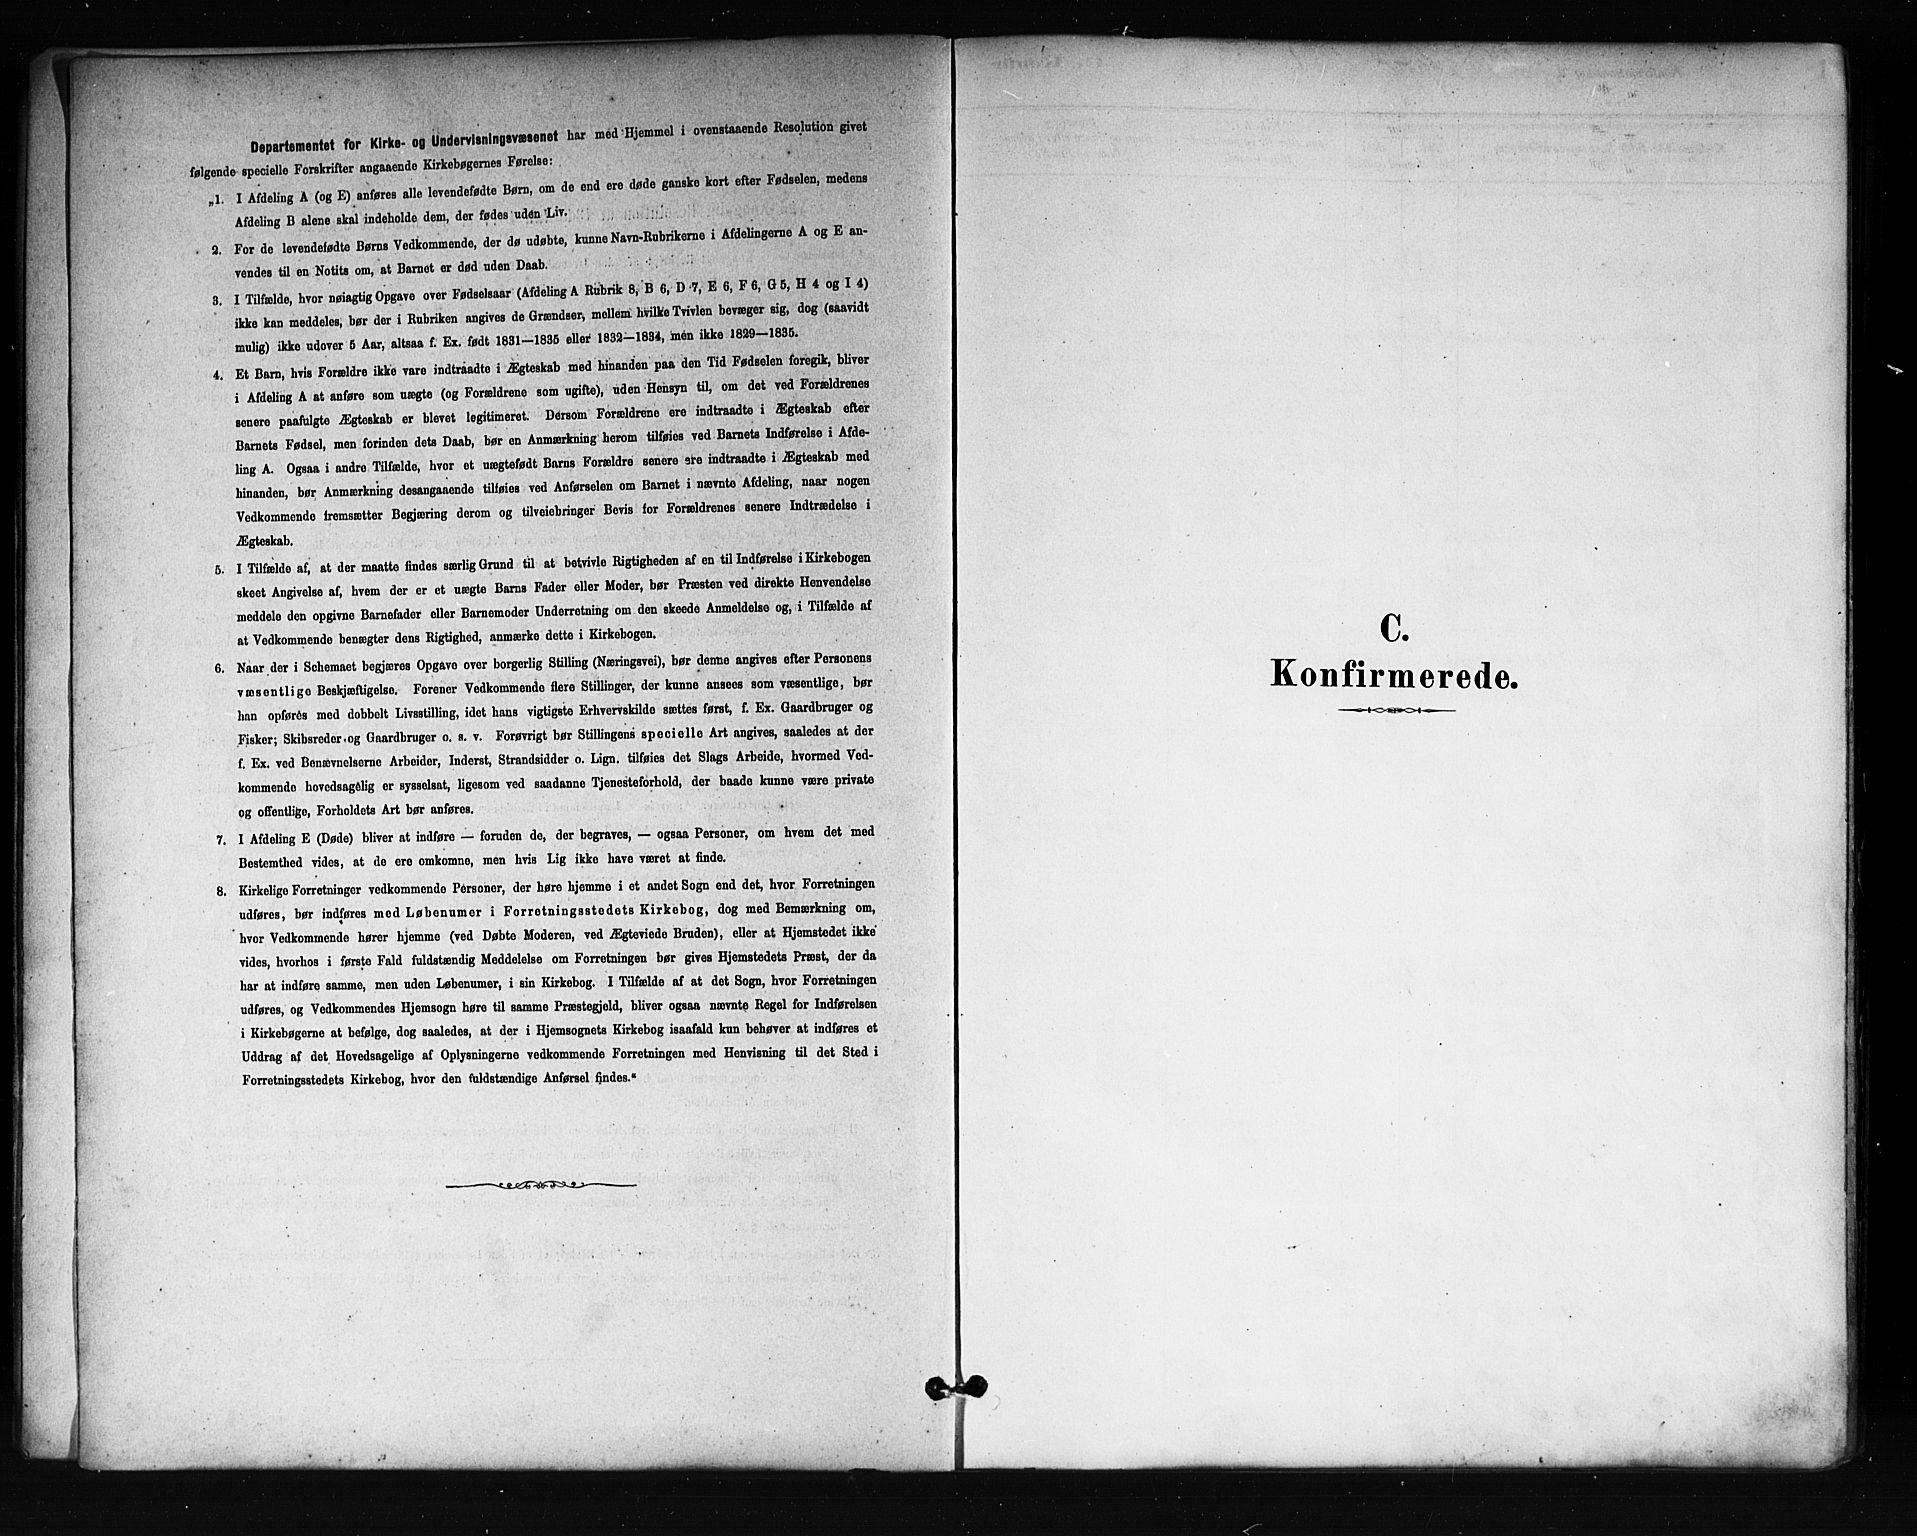 SAO, Uranienborg prestekontor Kirkebøker, F/Fa/L0002: Ministerialbok nr. 2, 1880-1896